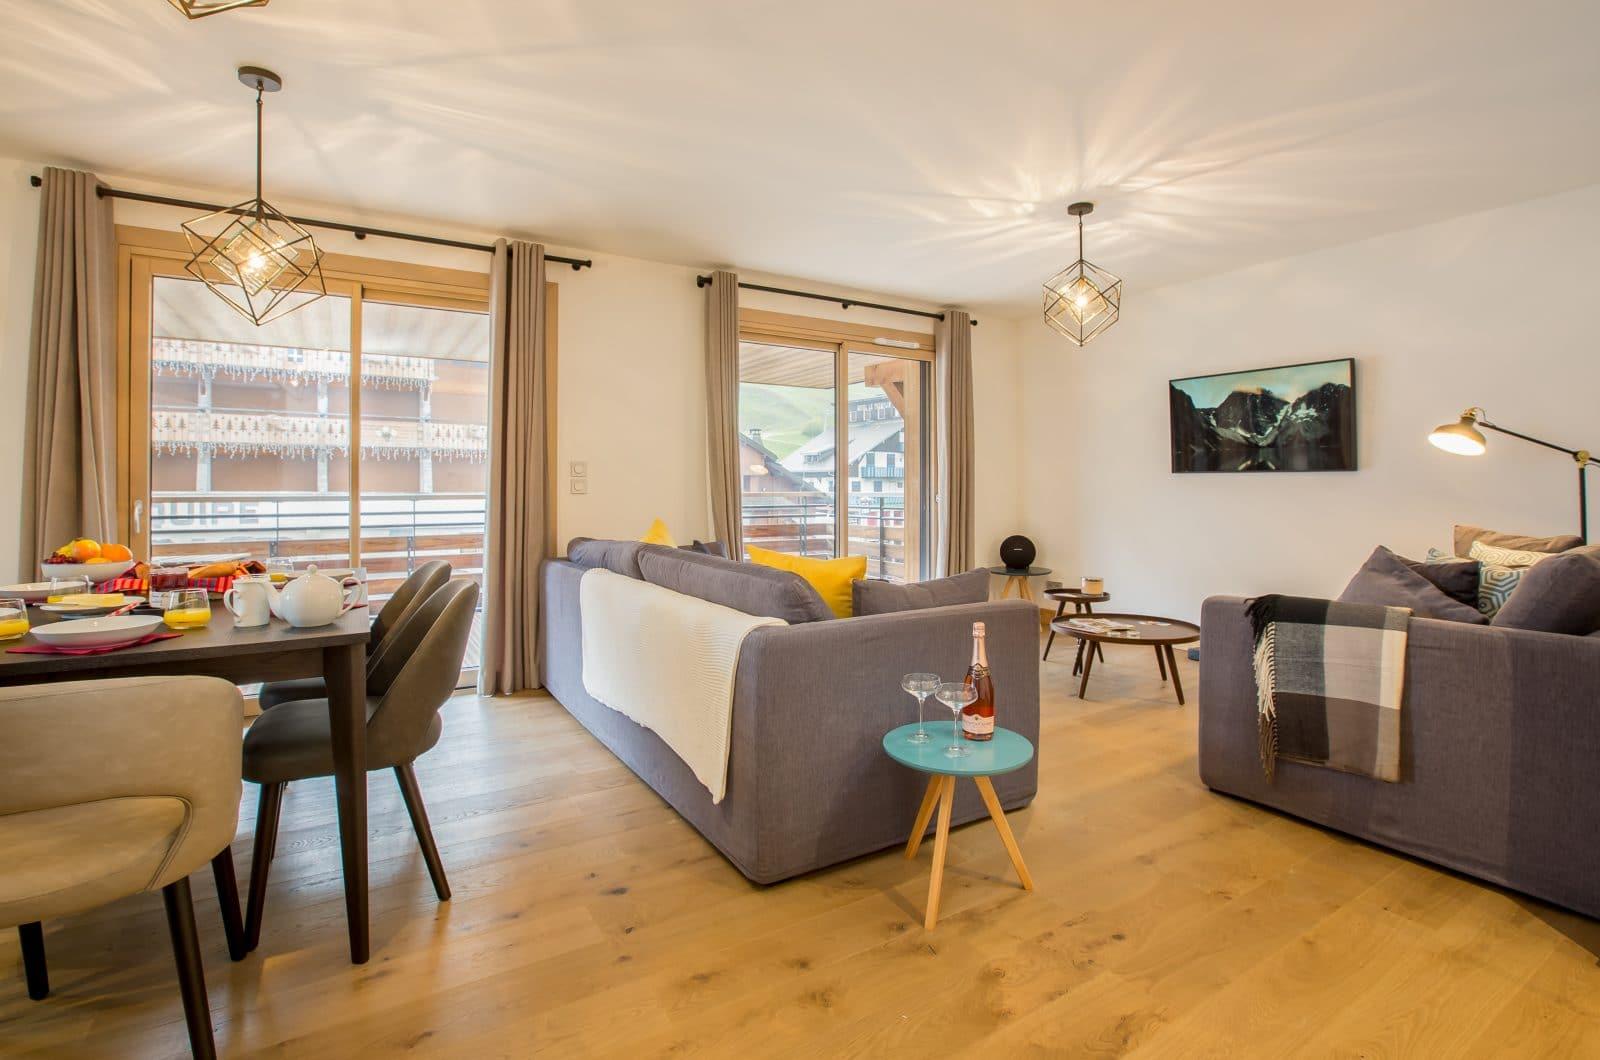 Apartment Asta Balcony 50m from Pleney Lift Morzine